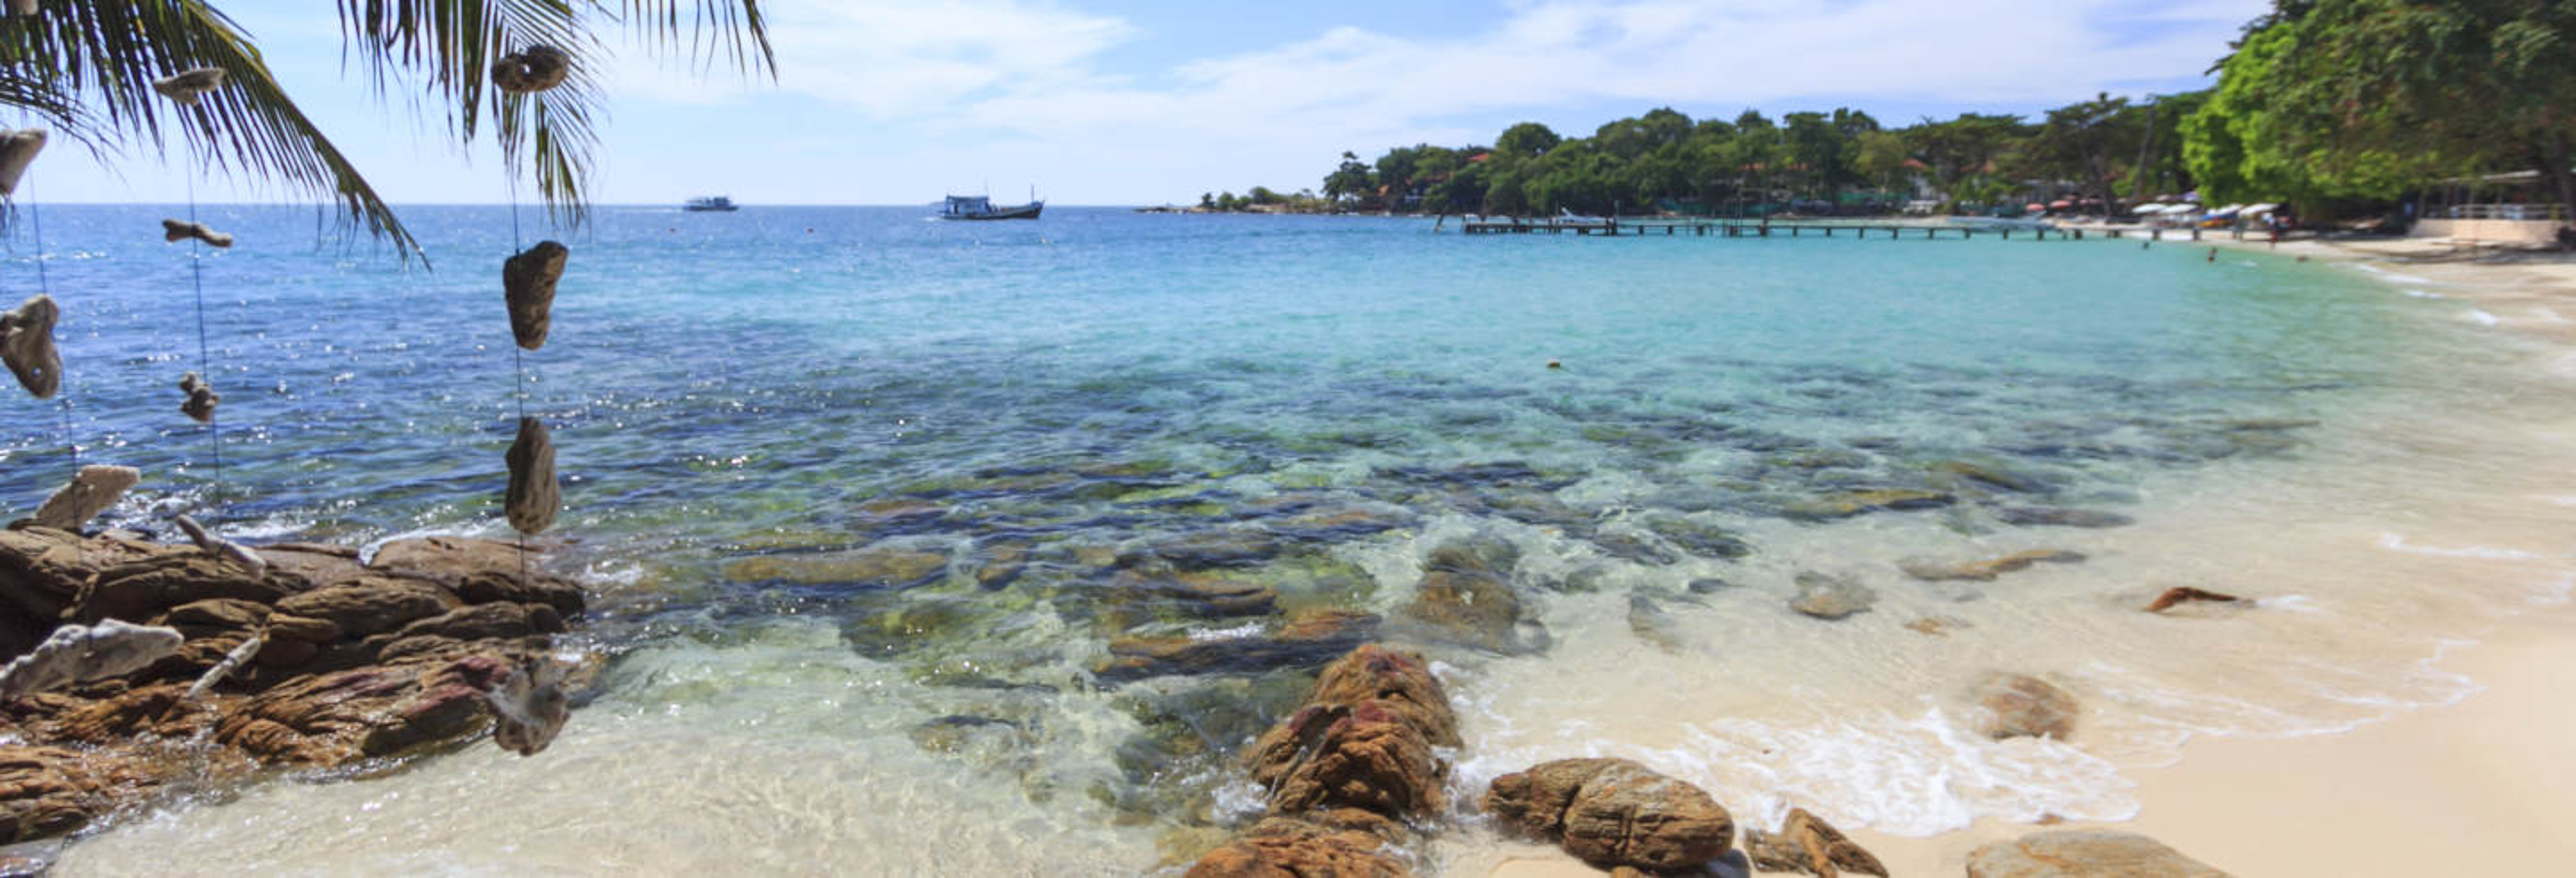 Tour en barco por las playas de Koh Samet